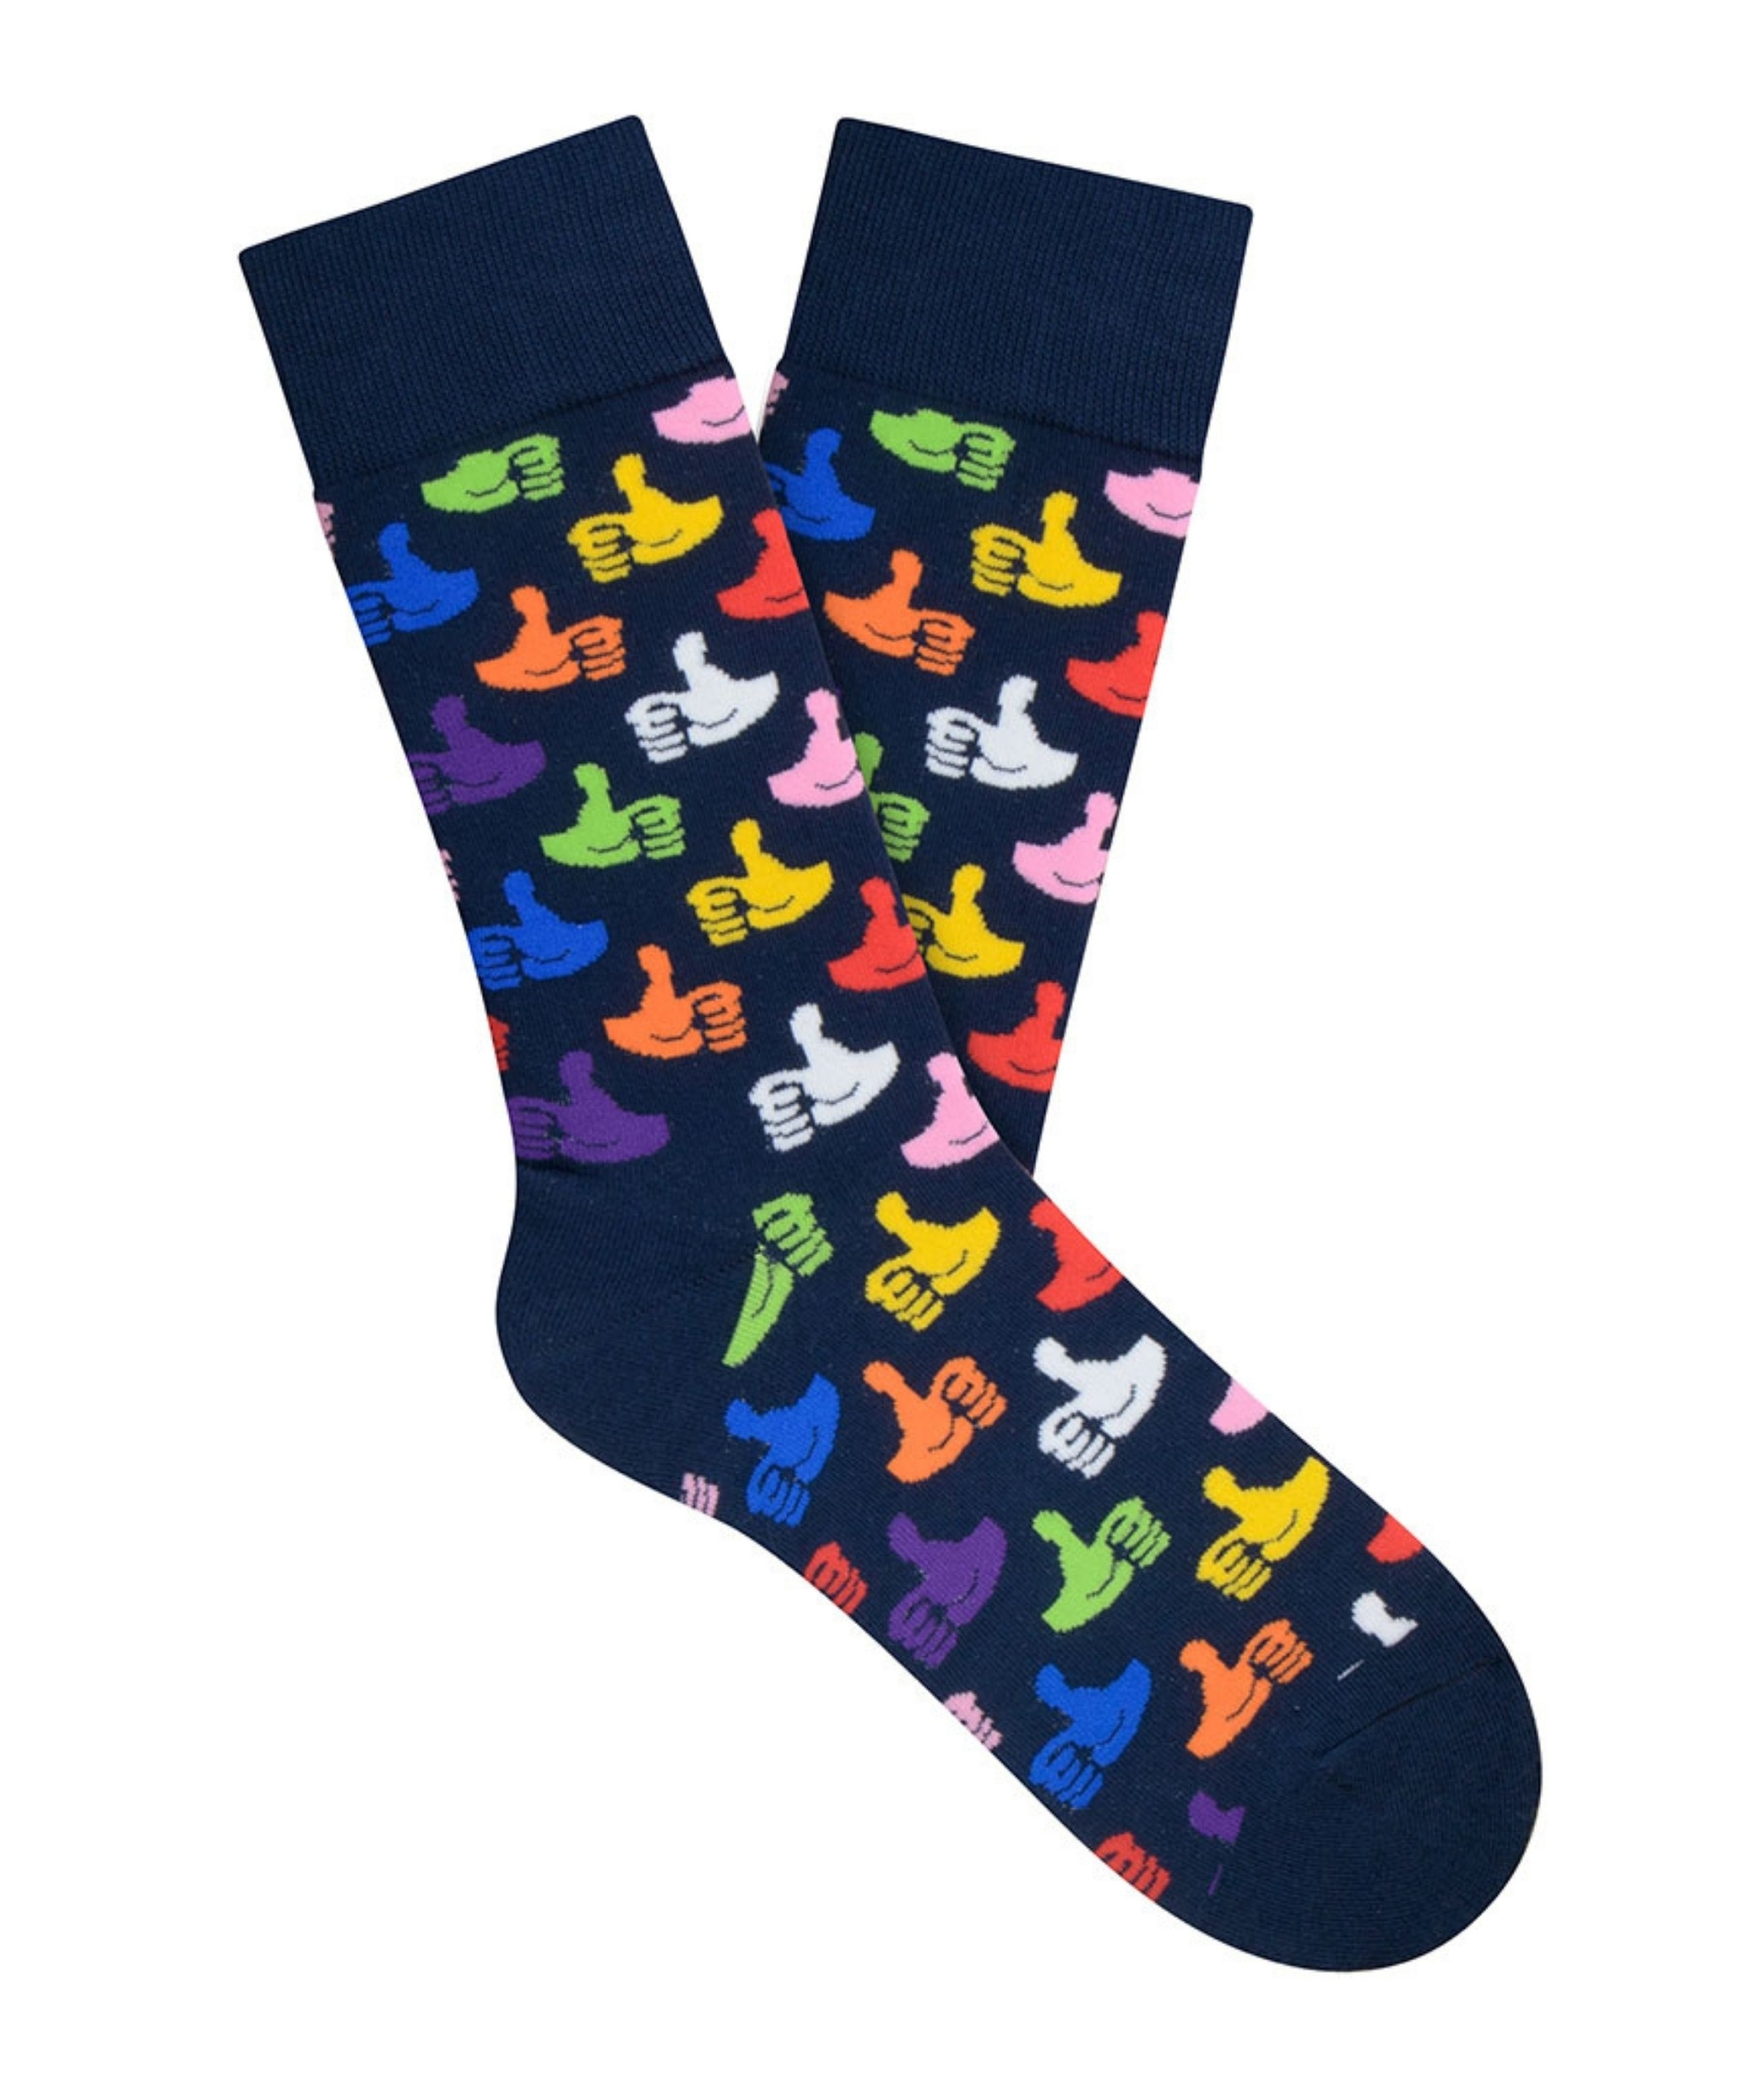 Sock Alto Kylie - Like Multicolor